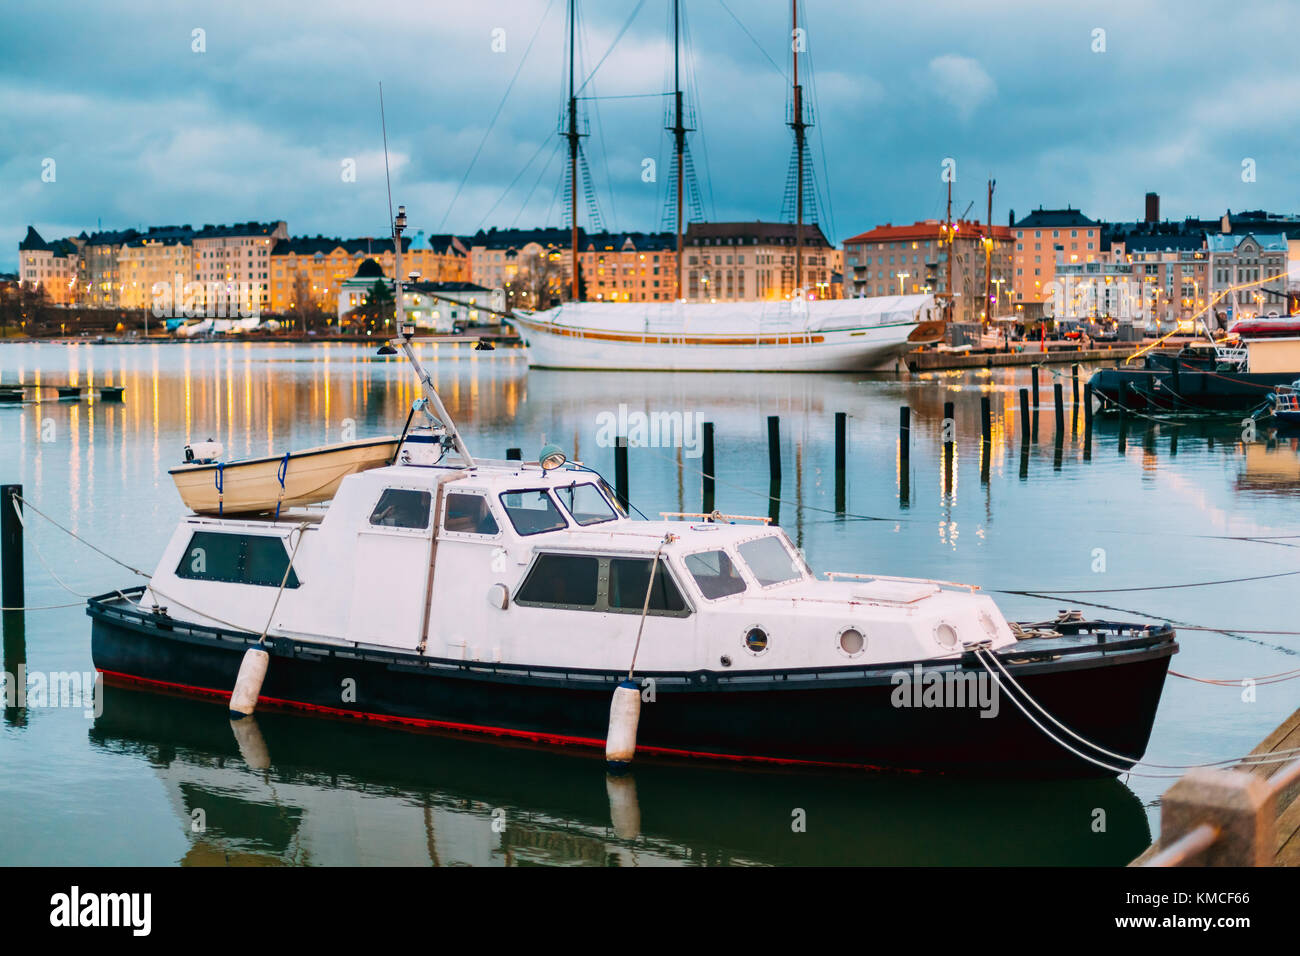 Helsinki, Finnland. marine Boot, Motorboot in Abend Beleuchtung am Pier. Stockbild